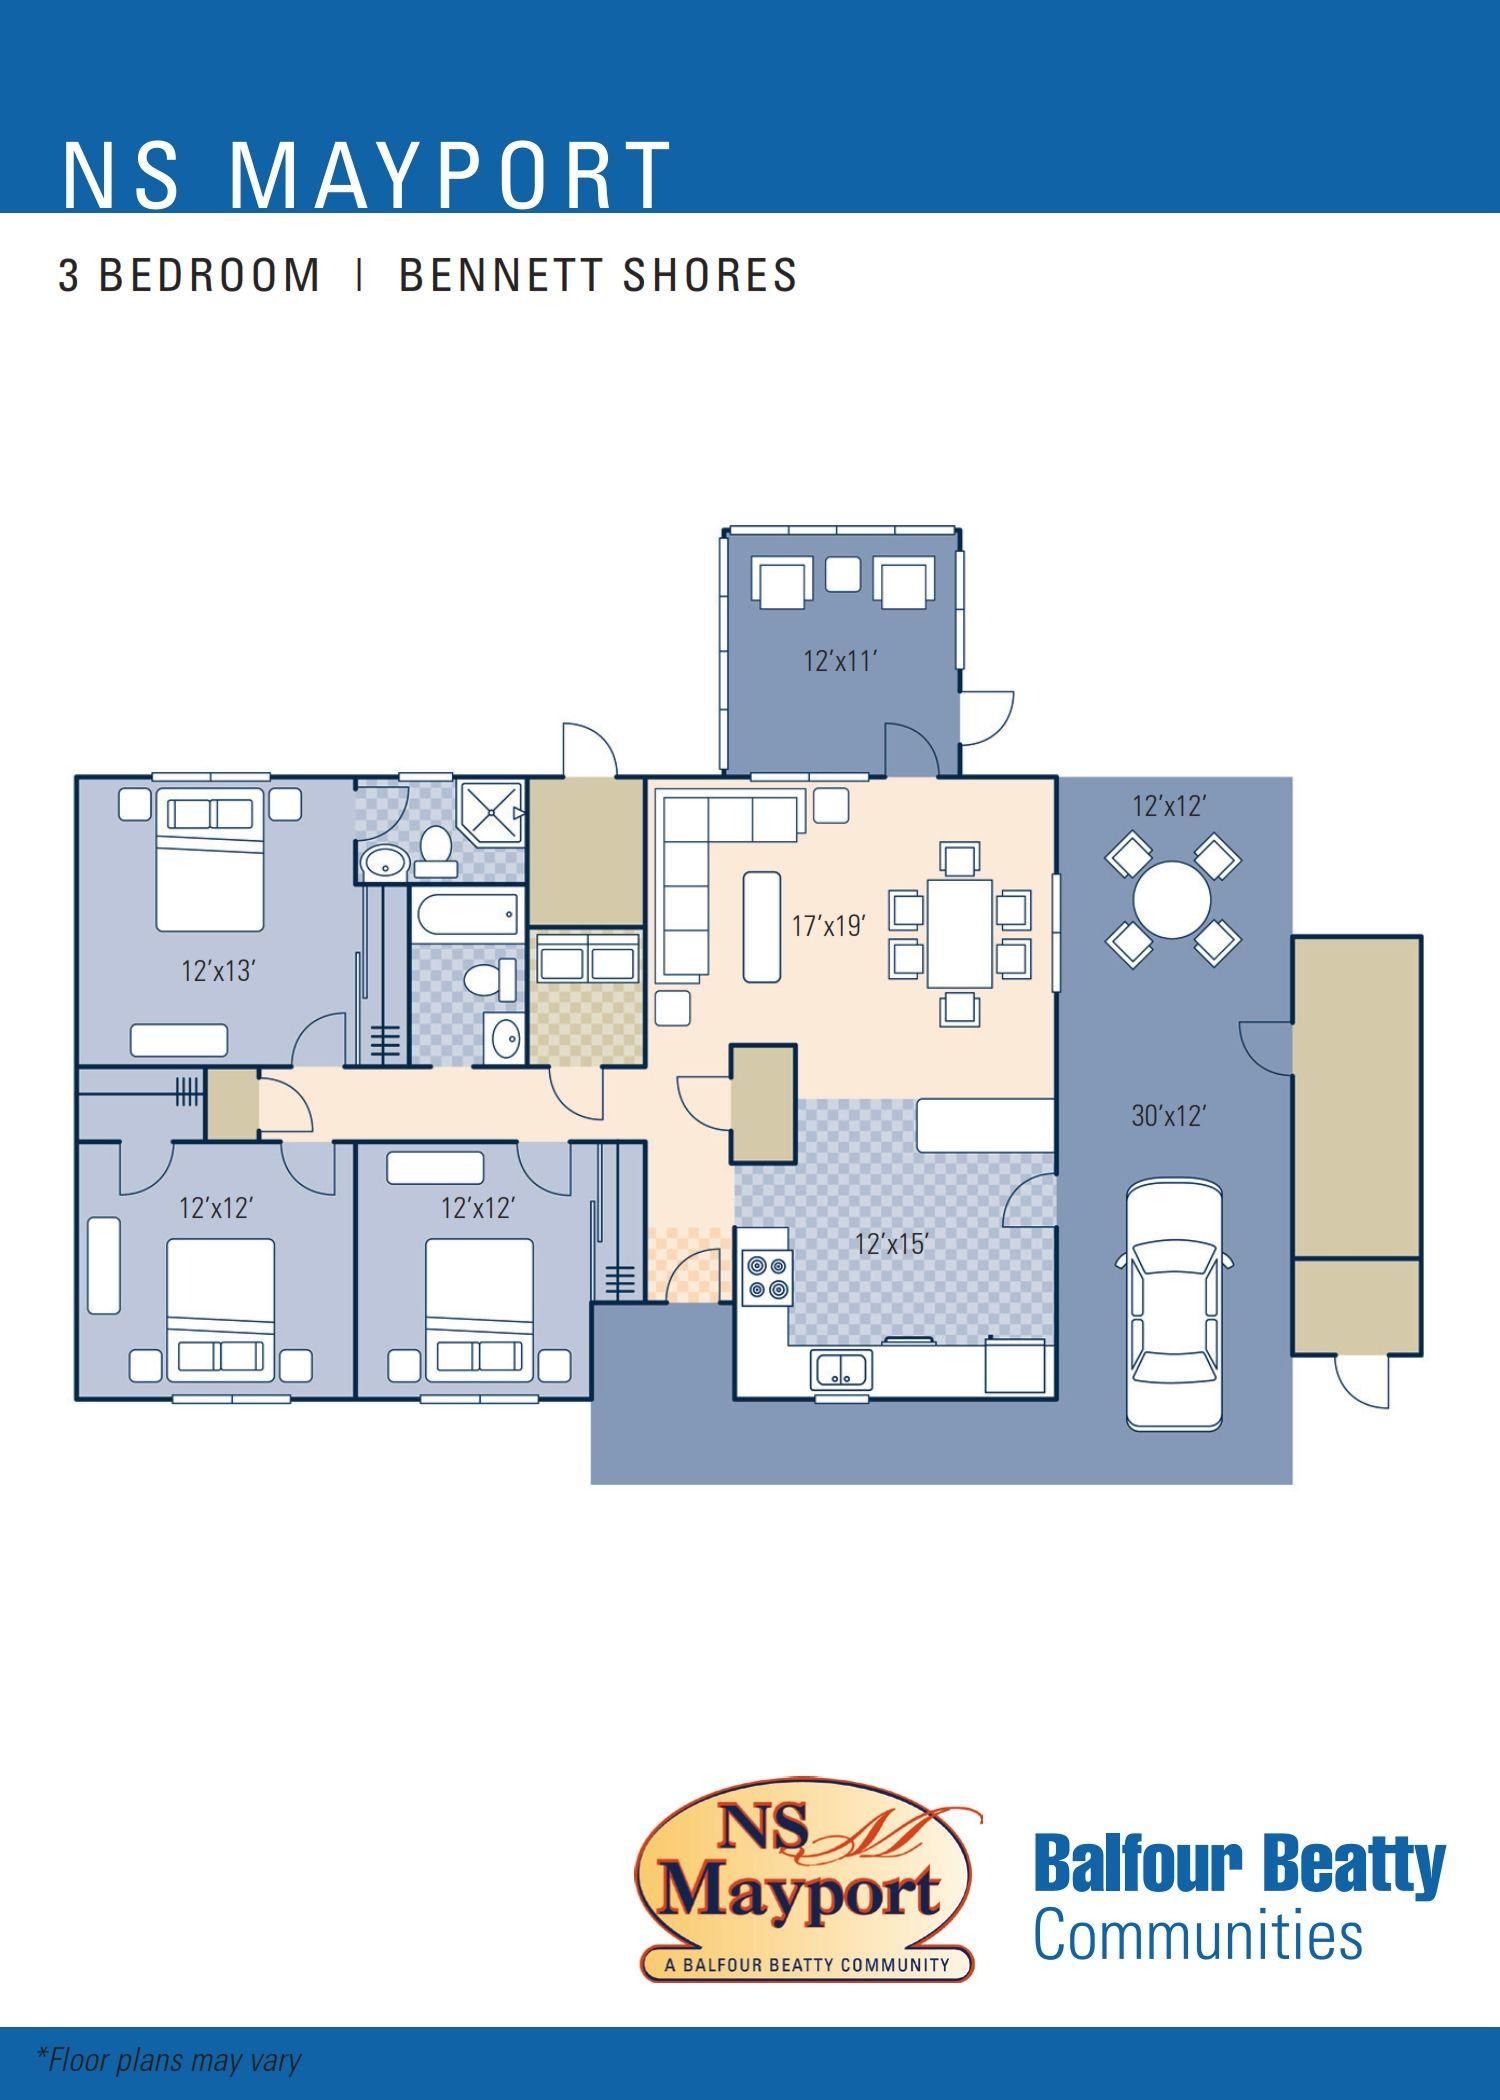 nsa naples u2013 parco baldascino neighborhood 3 bedroom floor plan